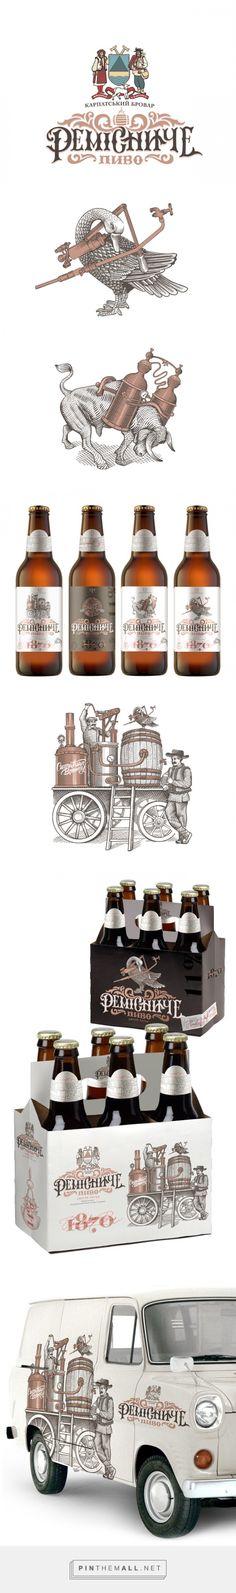 Remisnyche #Beer packaging designed by Umbra-design Studio - http://www.packagingoftheworld.com/2015/09/remisnyche-beer.html